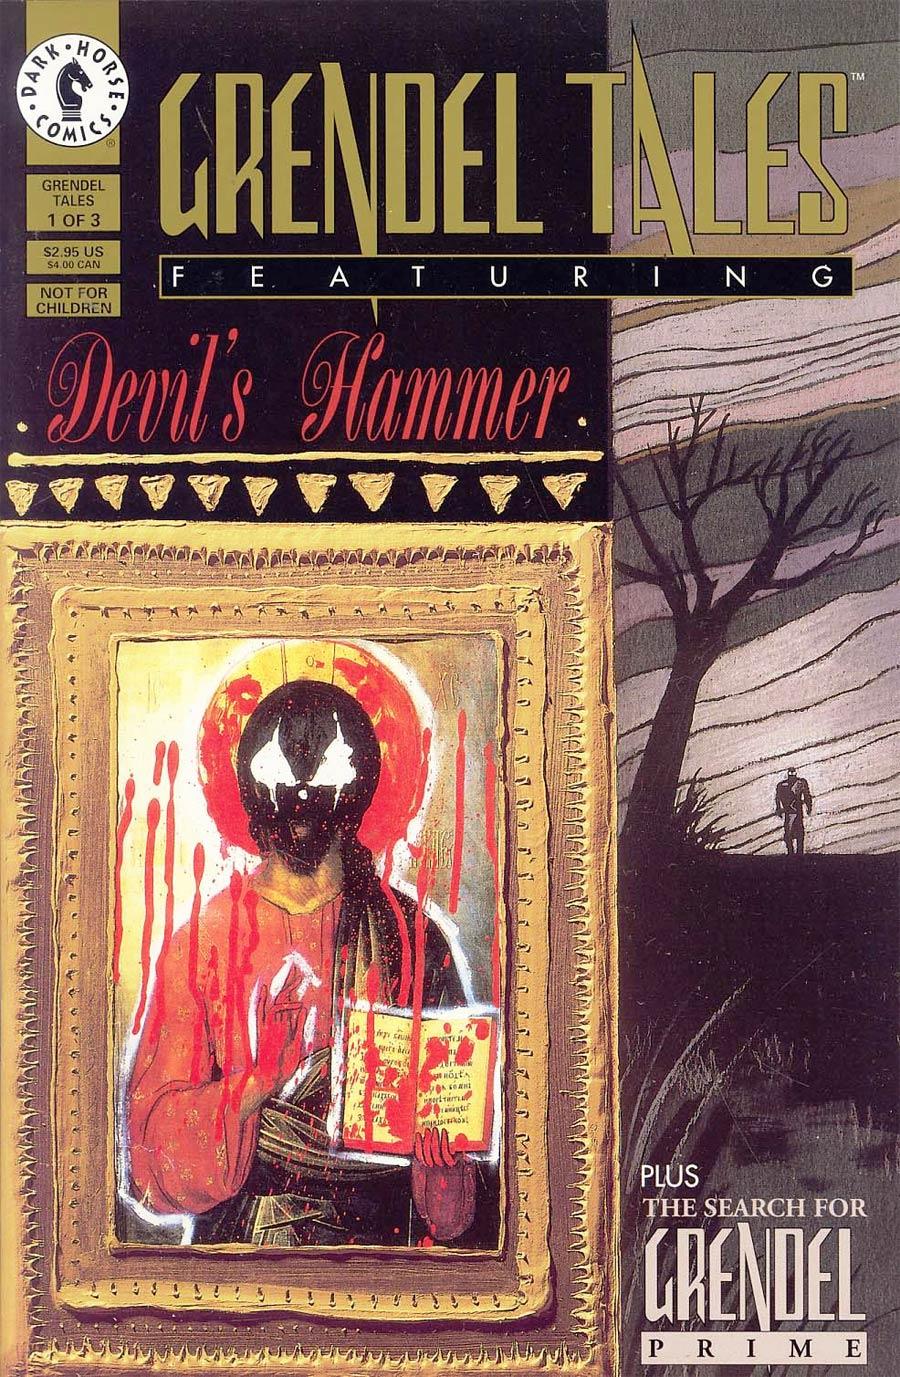 Grendel Tales The Devils Hammer #1